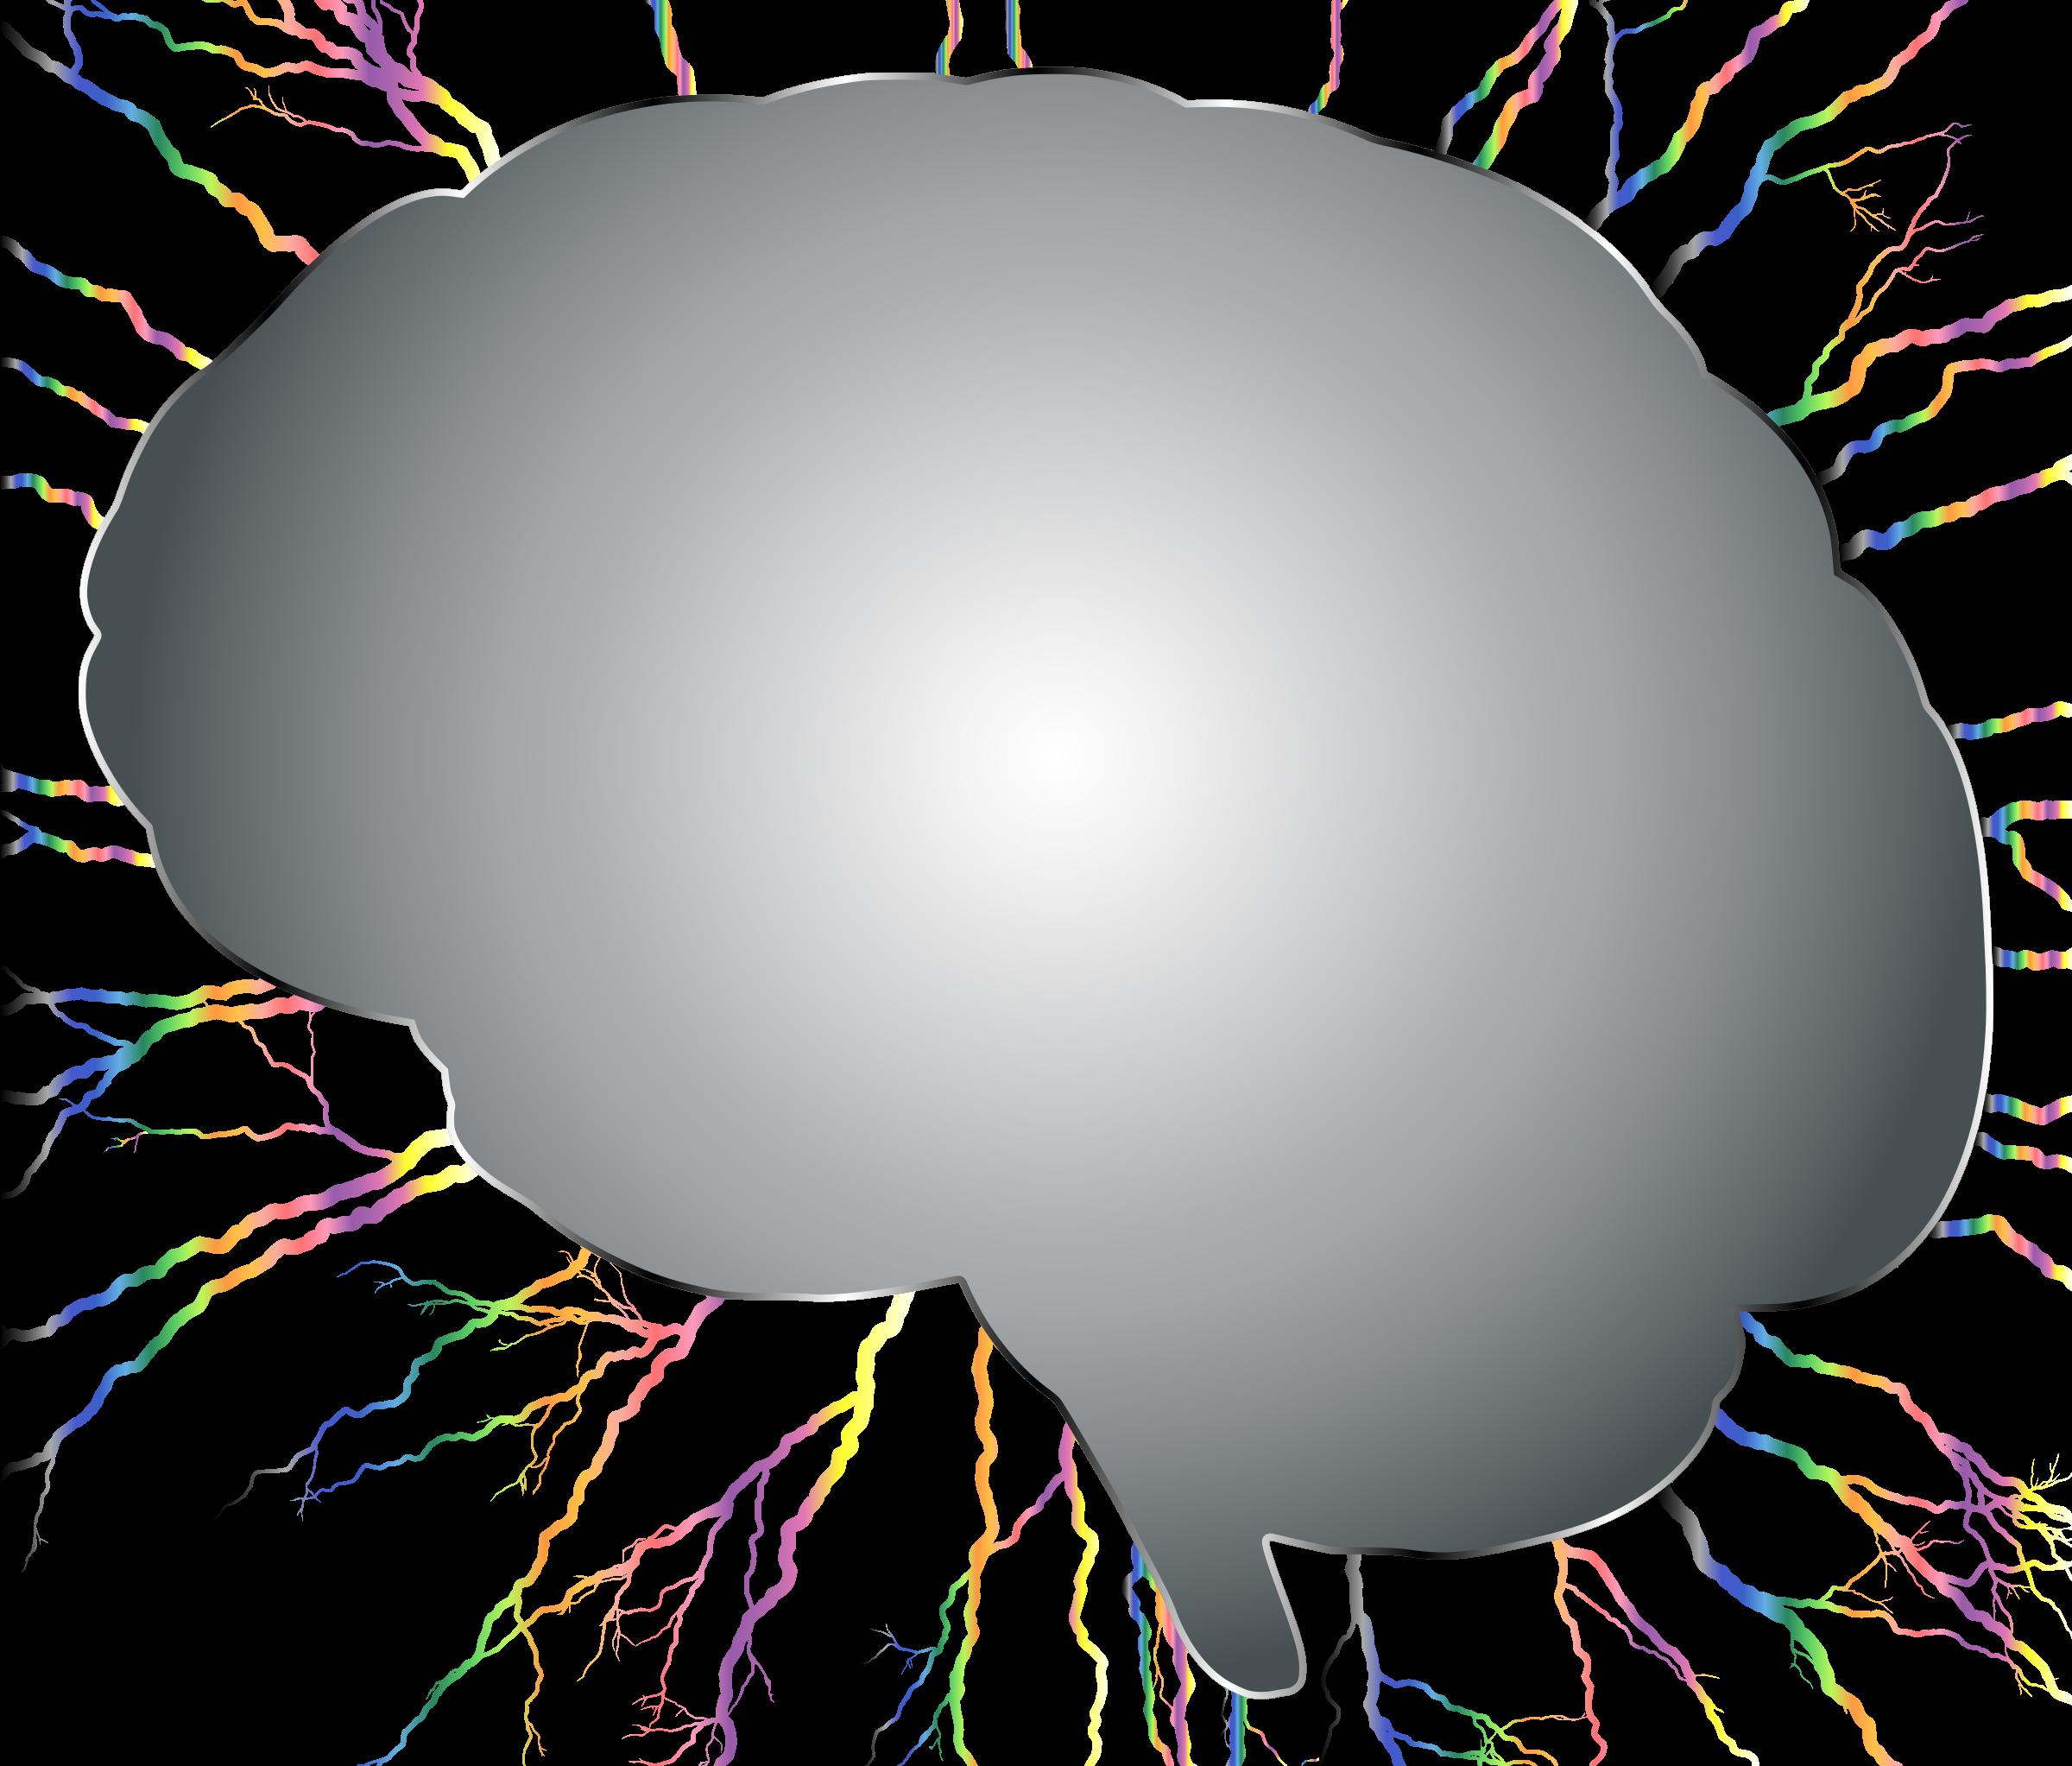 Storm no background big. Psychology clipart cool brain